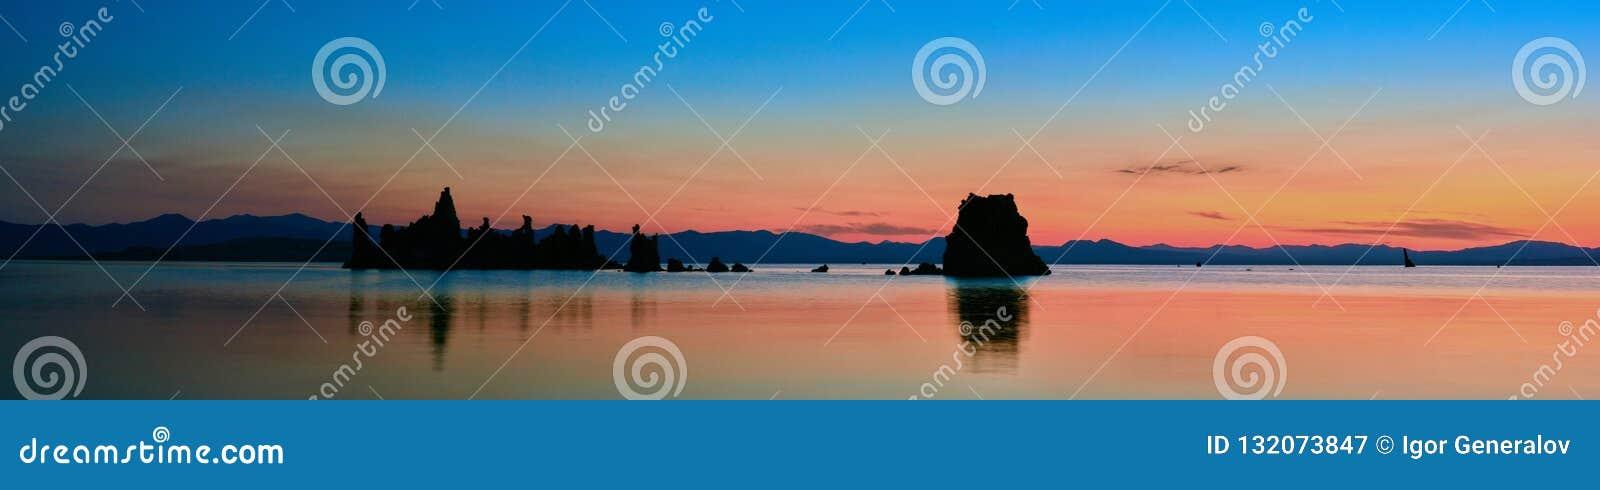 Mono alba del lago